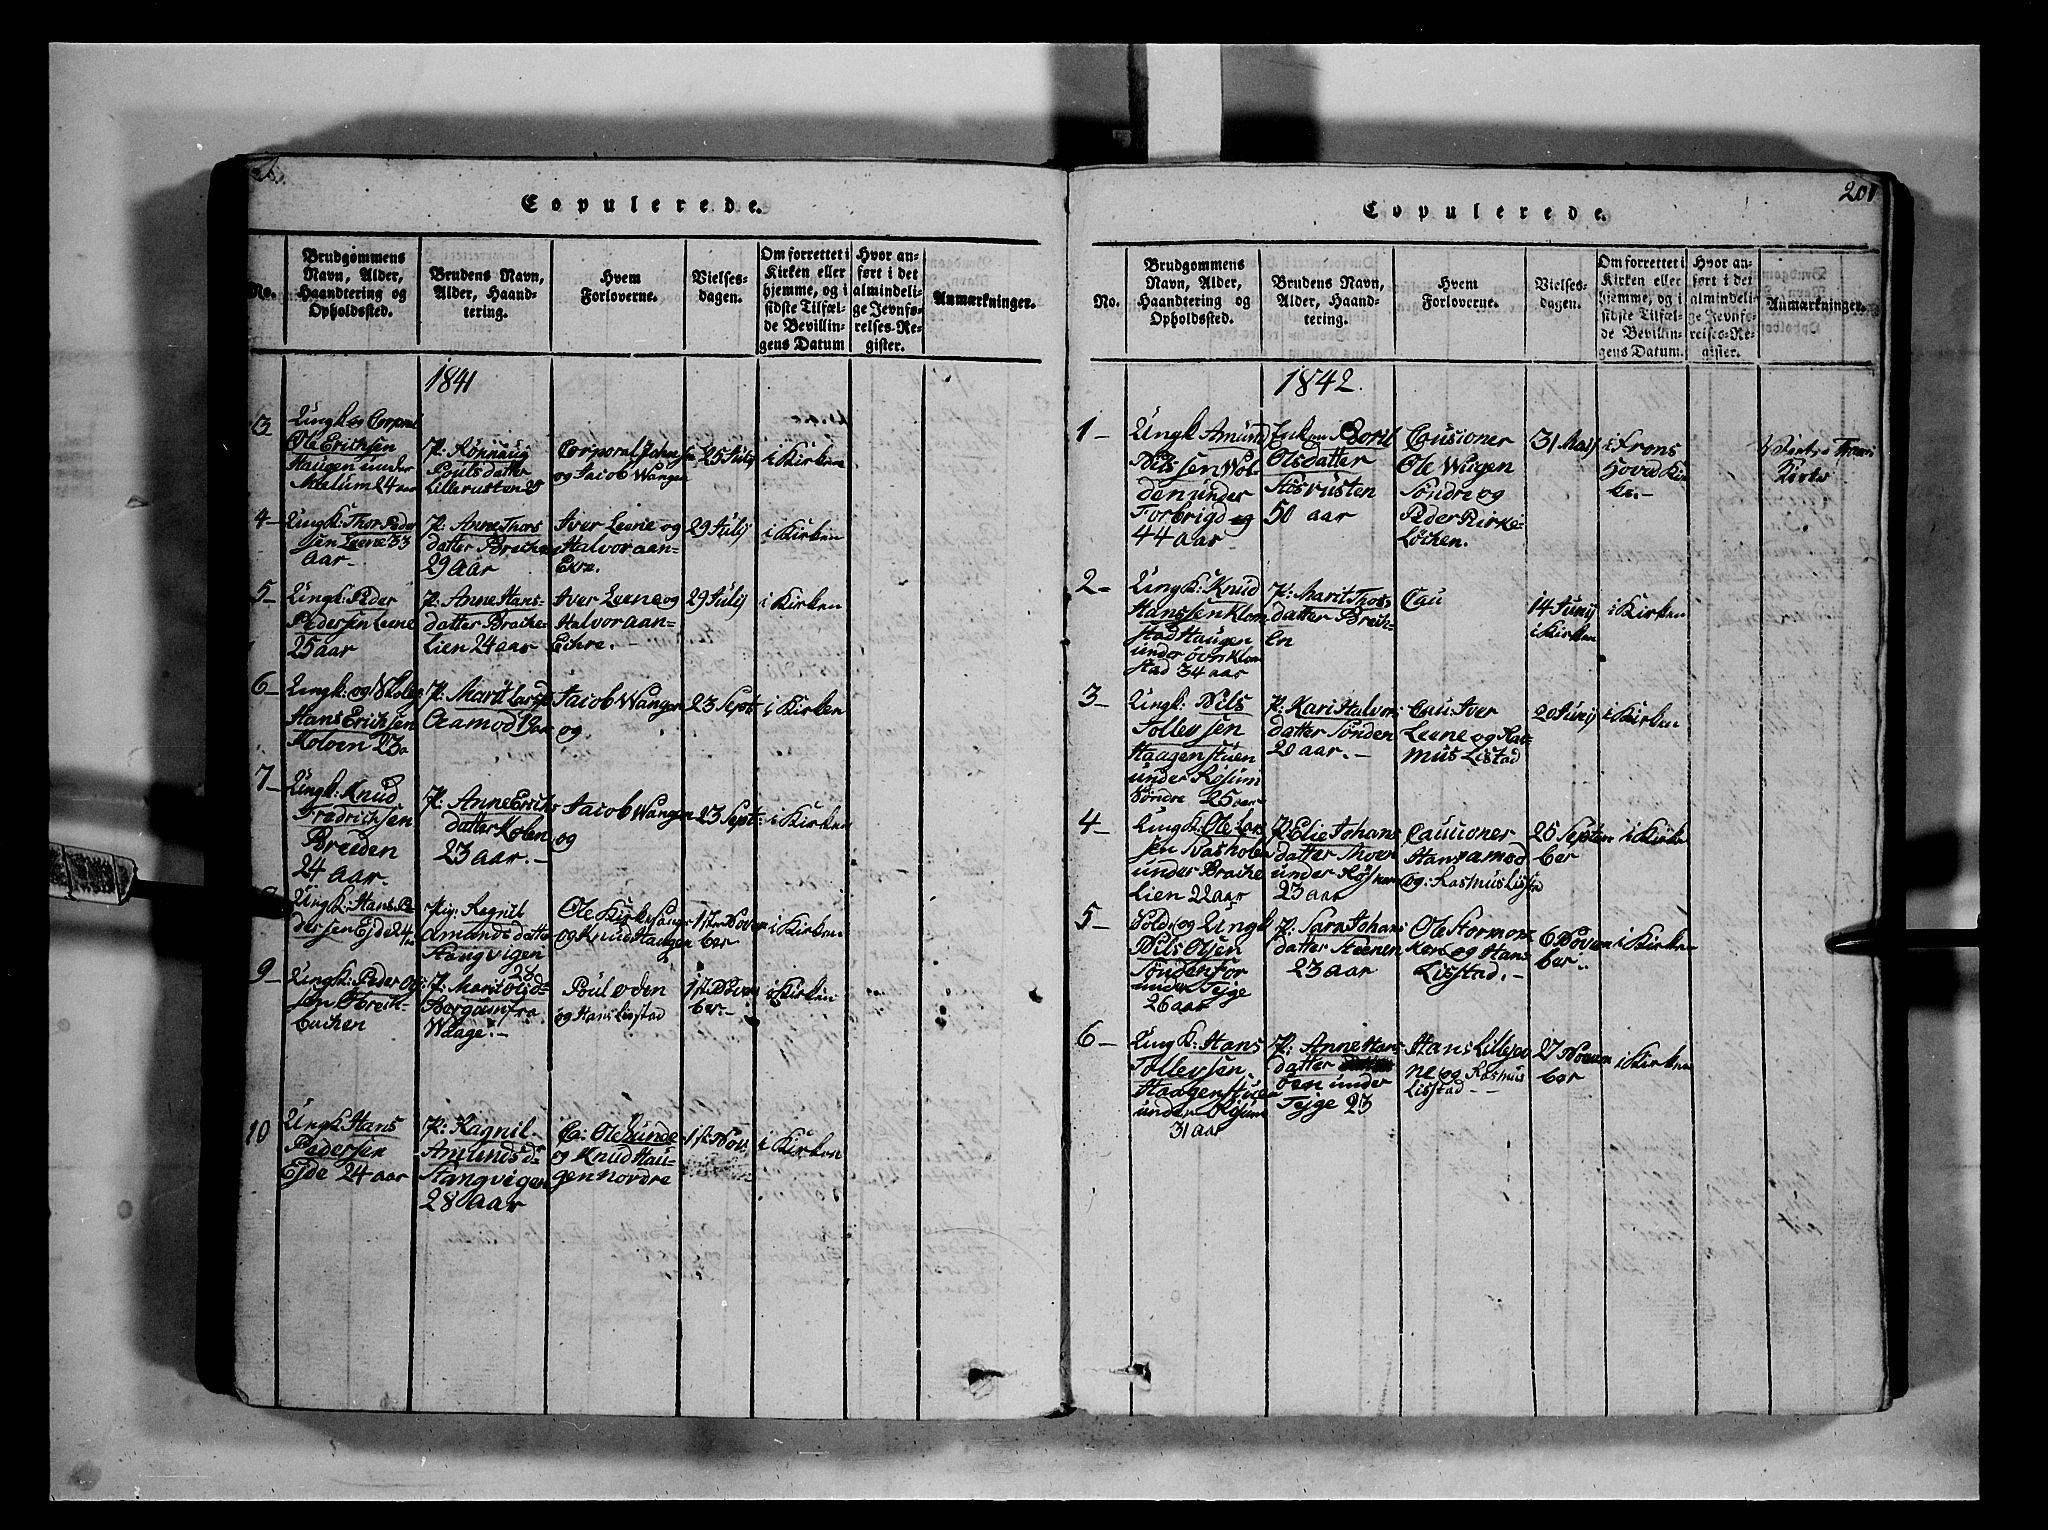 SAH, Fron prestekontor, H/Ha/Hab/L0002: Klokkerbok nr. 2, 1816-1850, s. 201